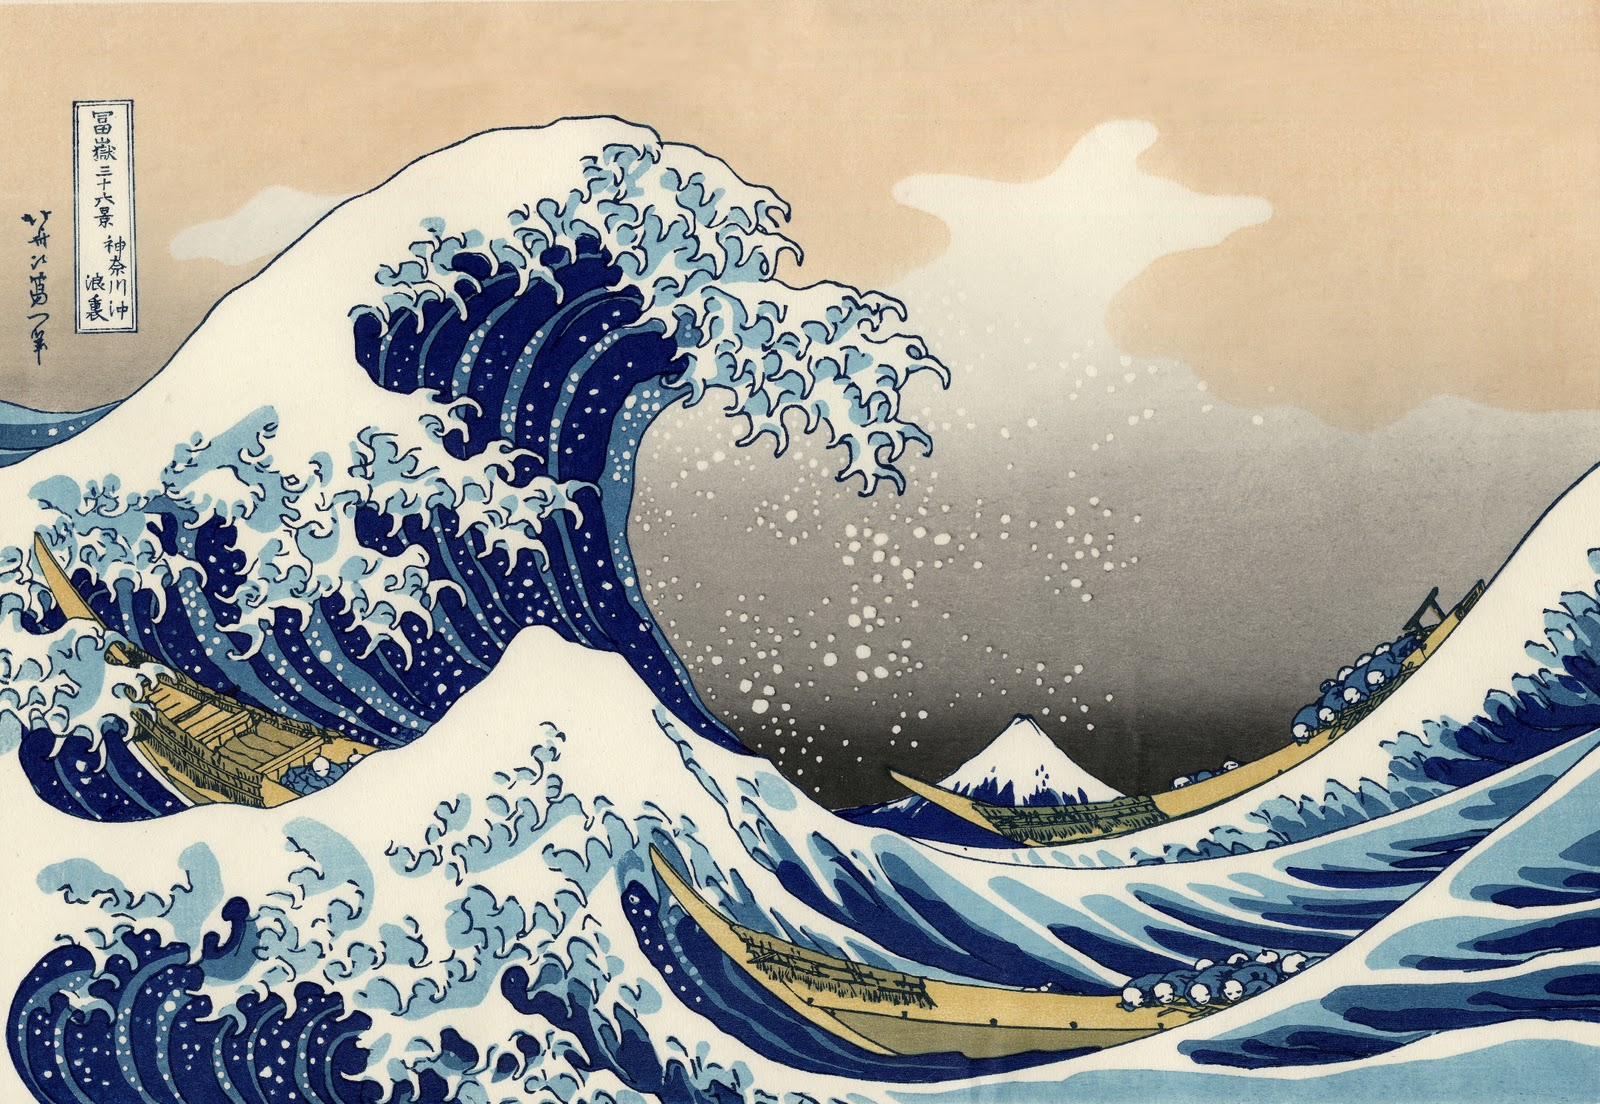 katsushika hokusai, the great wave off kanagawa